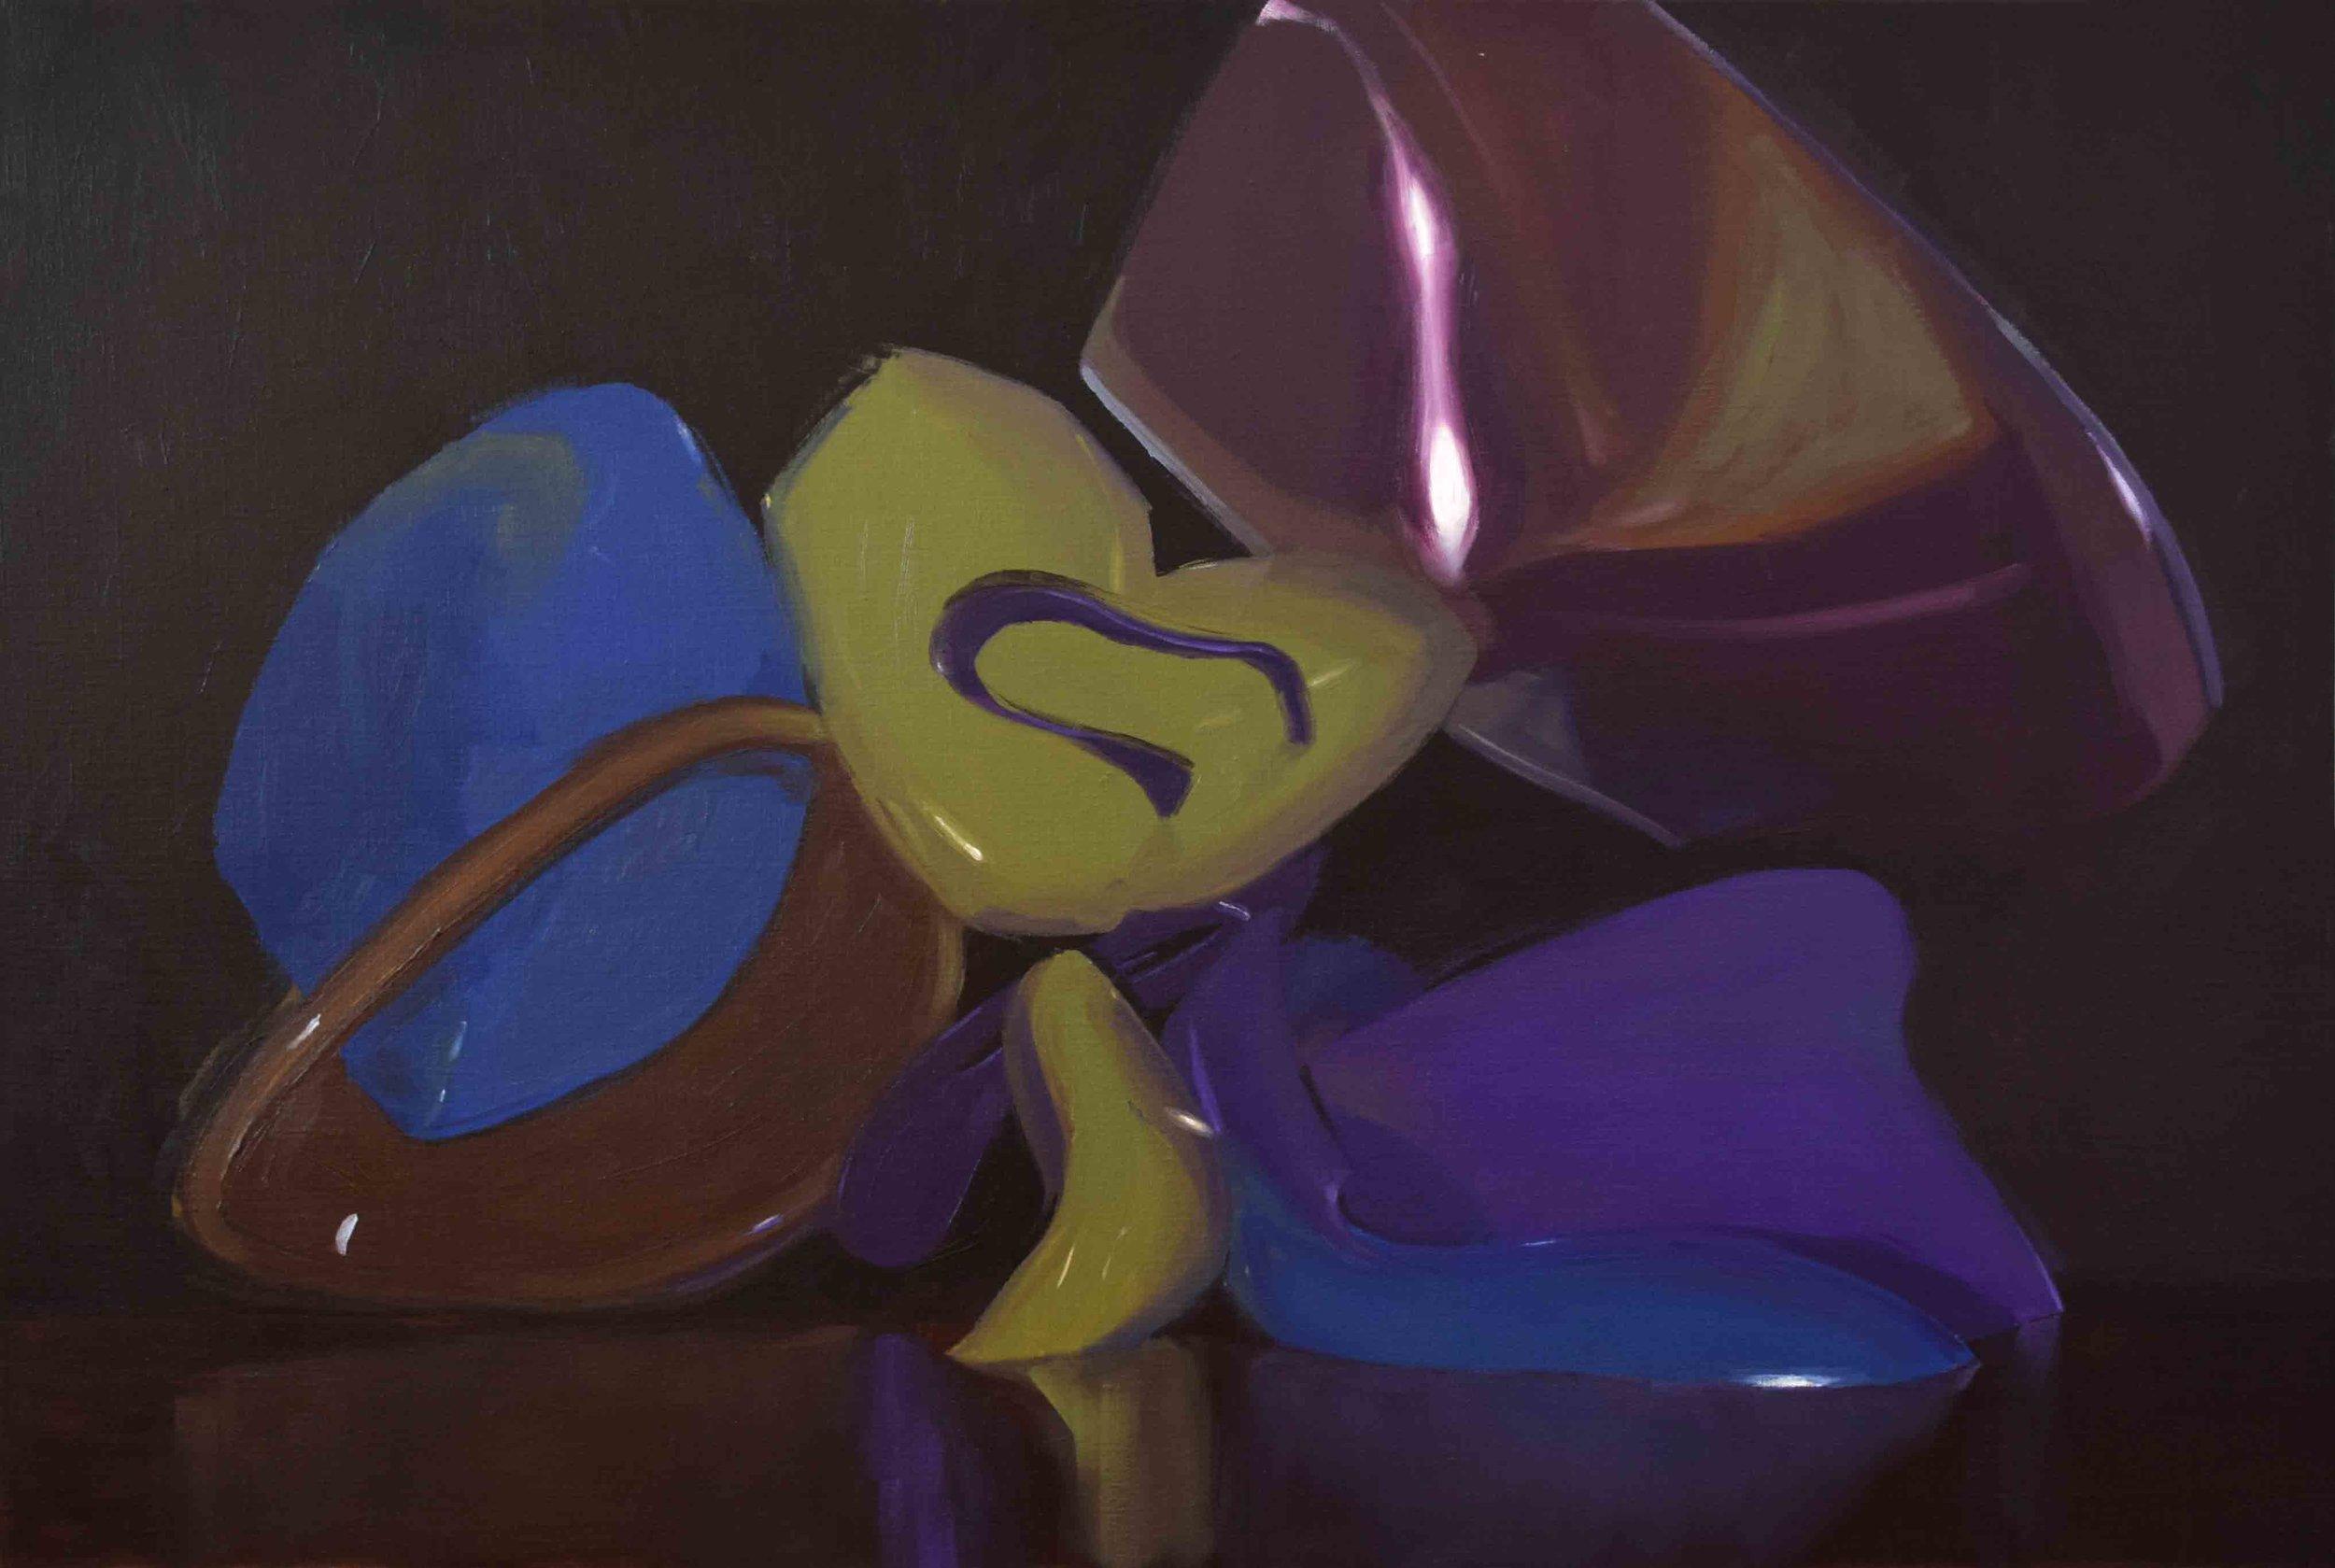 5. Ian Williams,  Low Key,  2019, oil on linen, 93 x 140 cm $2,350